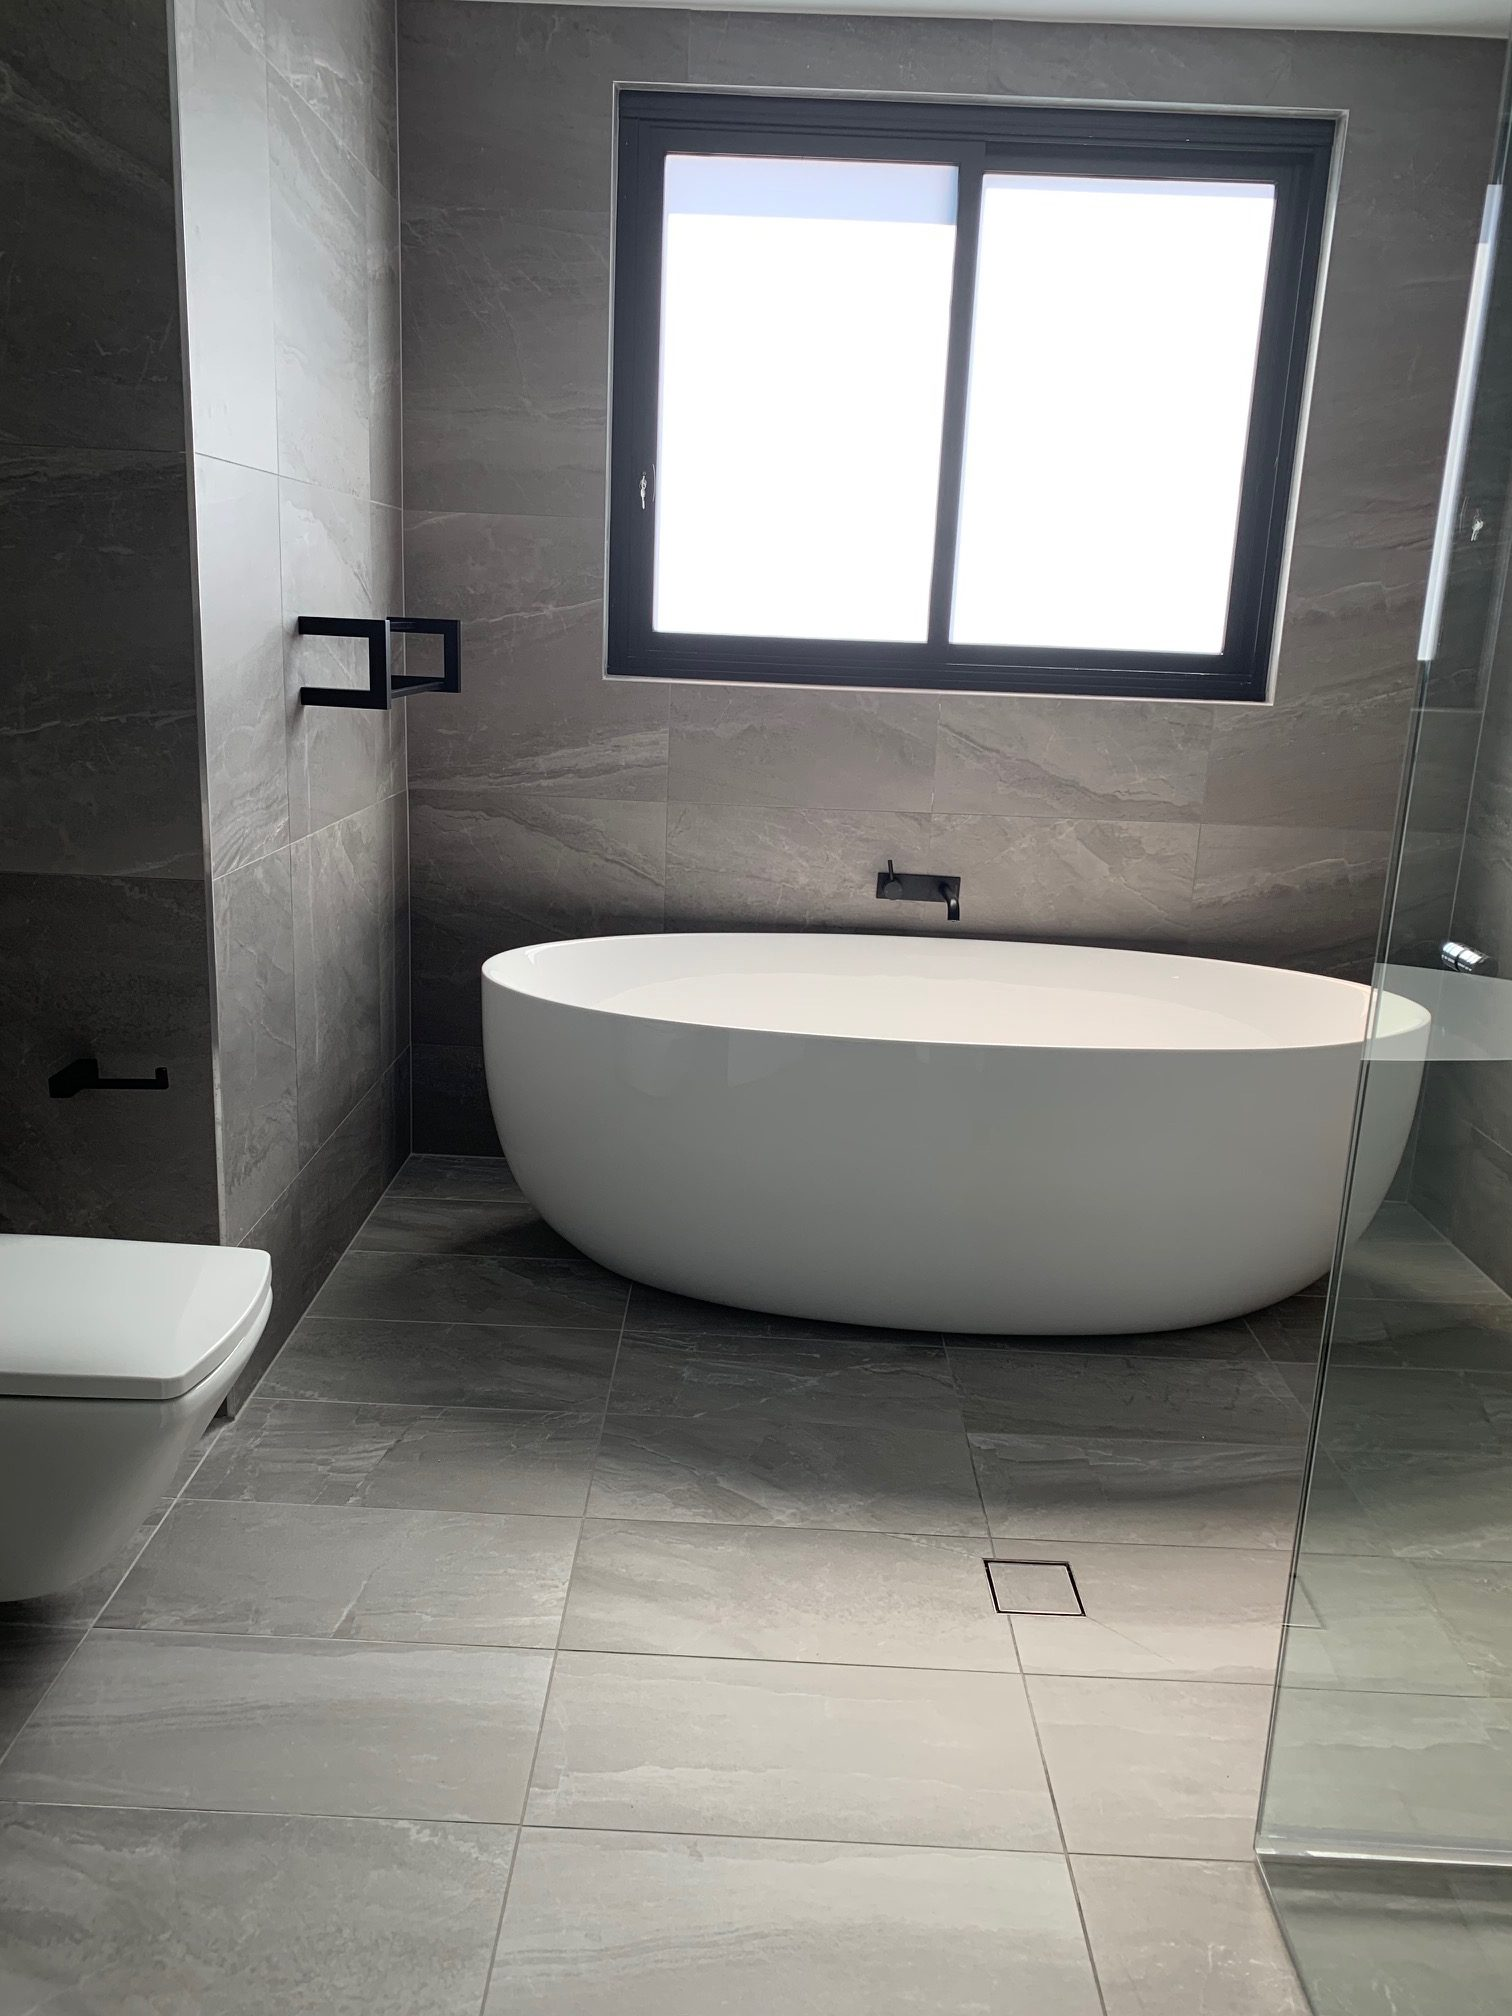 Bathtub showcase with Warmtech Inscreed heating system